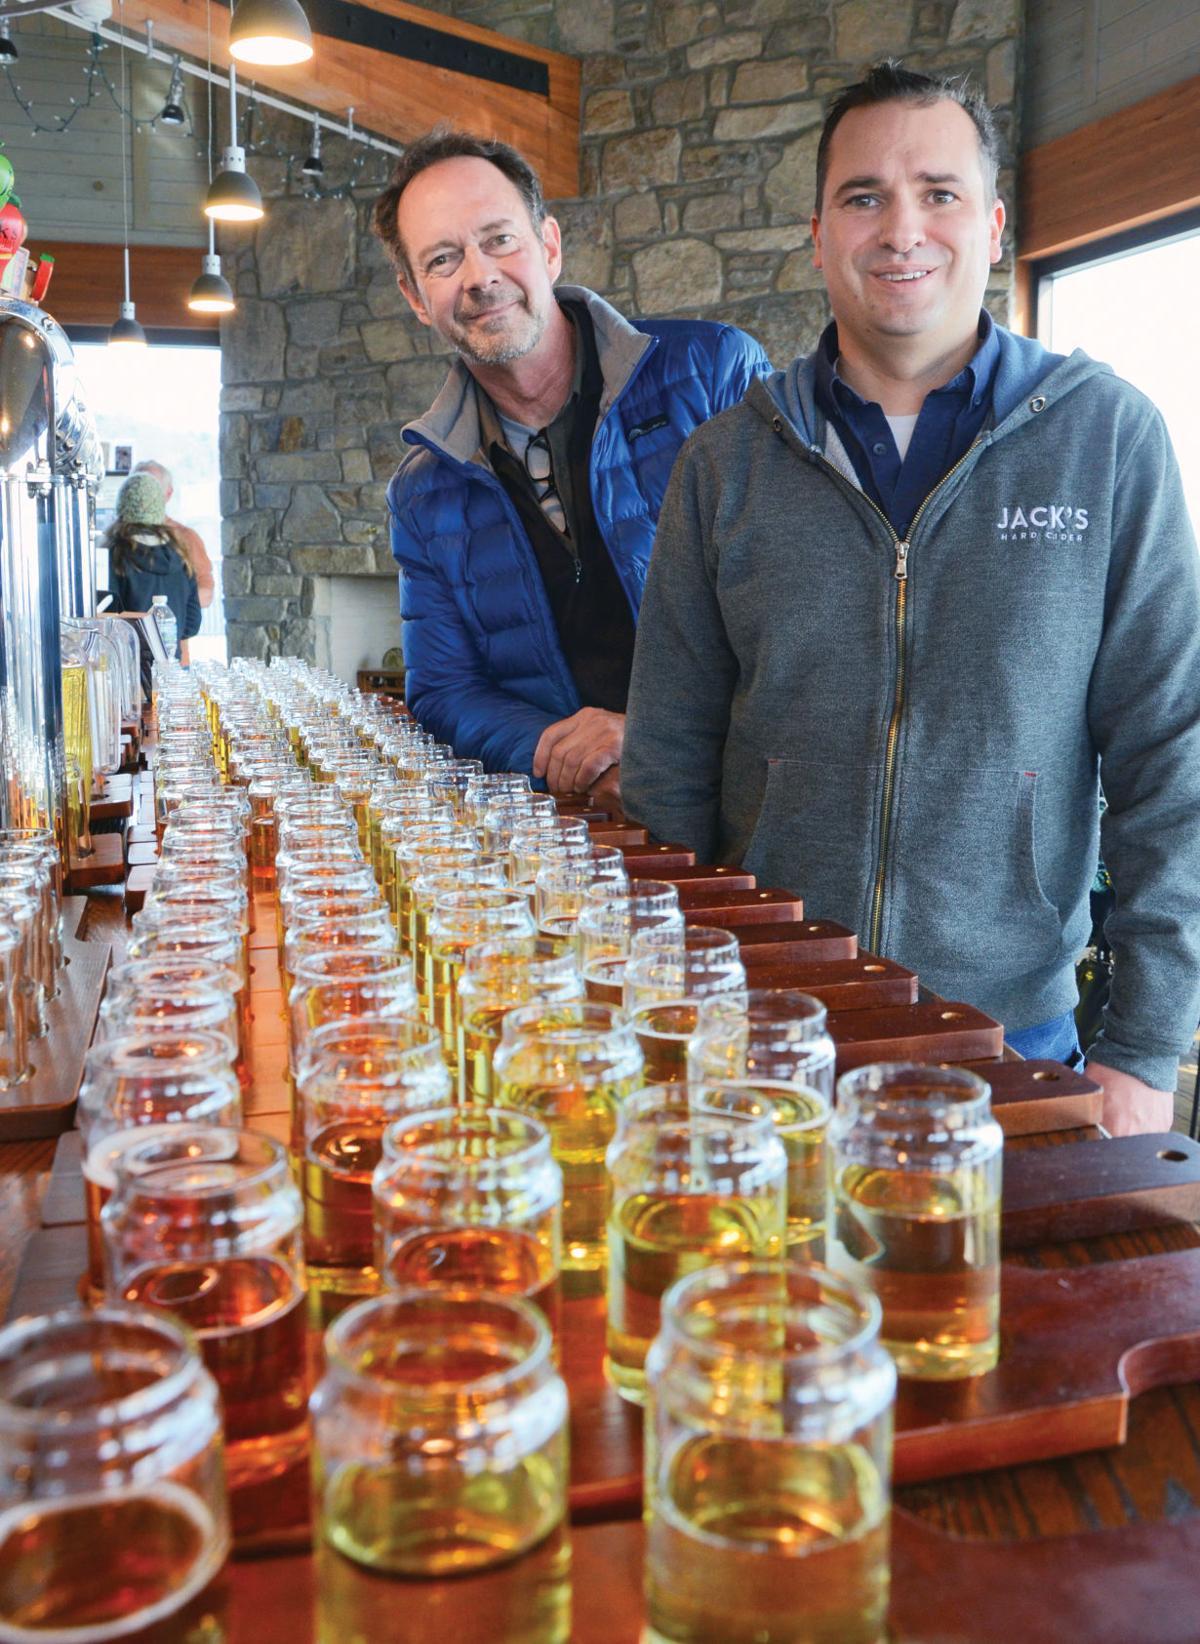 CiderCon rolls through county